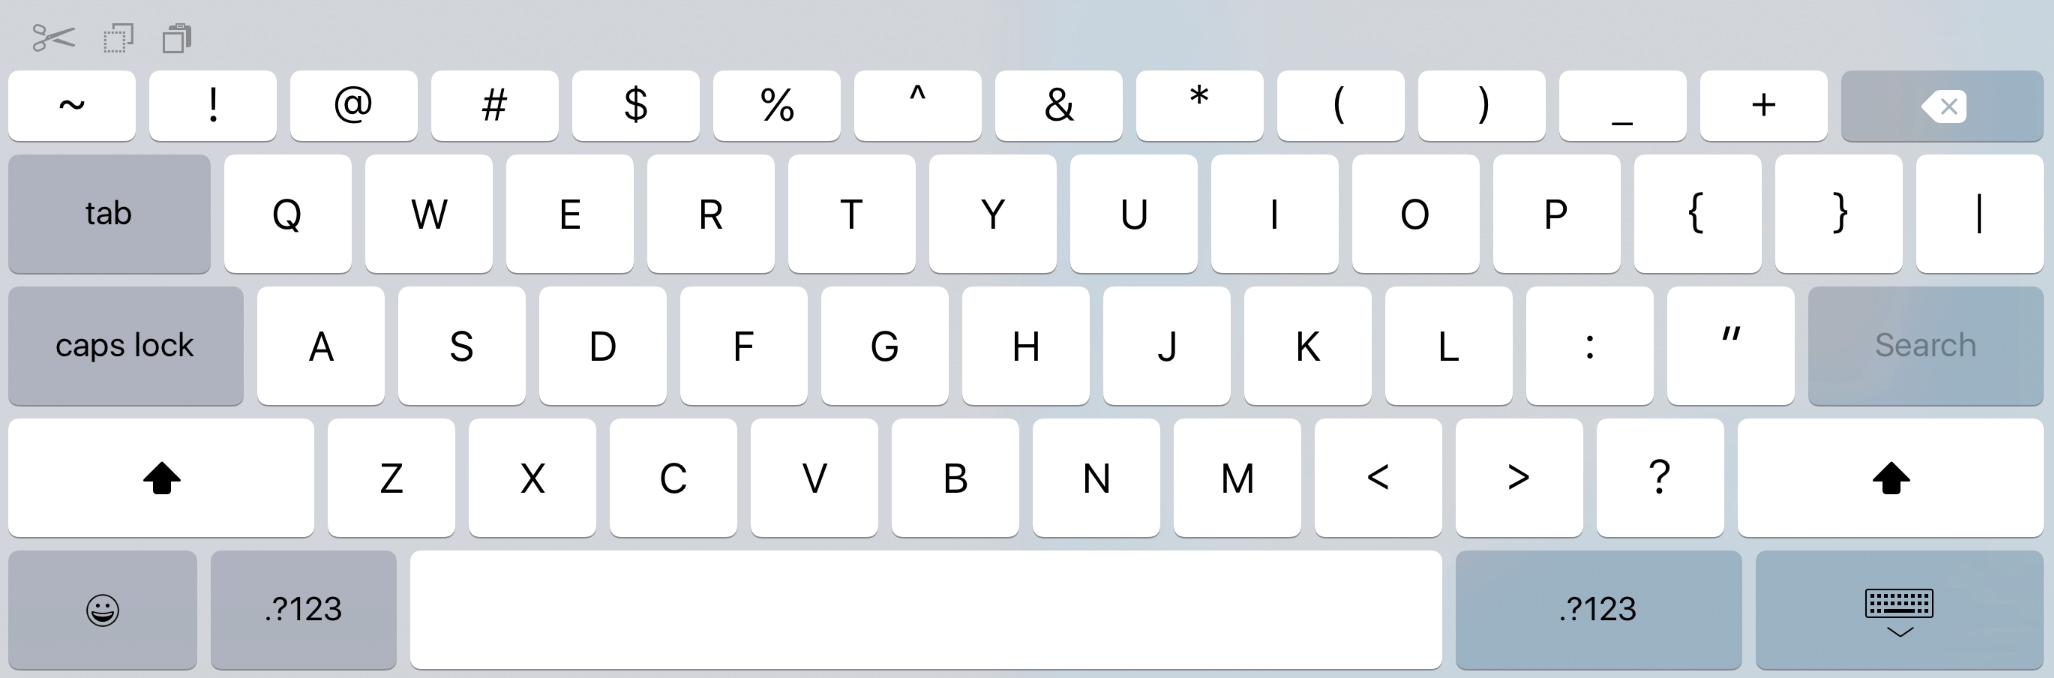 ipad plus pro tastatur keyboard